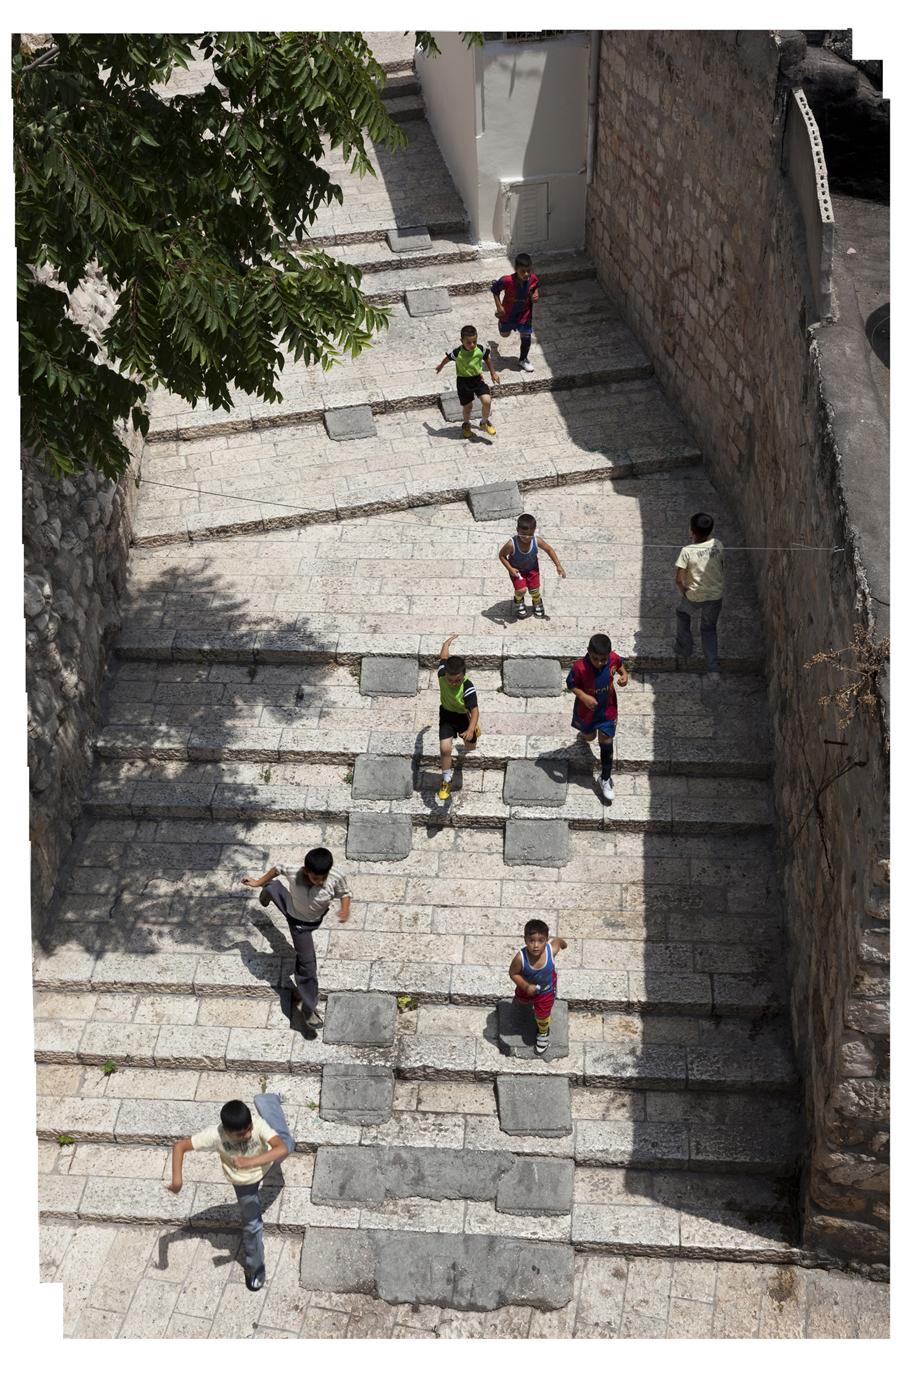 "Bill Aron  Tallit Steps Revisited, Jerusalem  Archival inkjet print on Epson Ultra Smooth Fine Art paper, 1/18 19.75 x 13"" AB19"